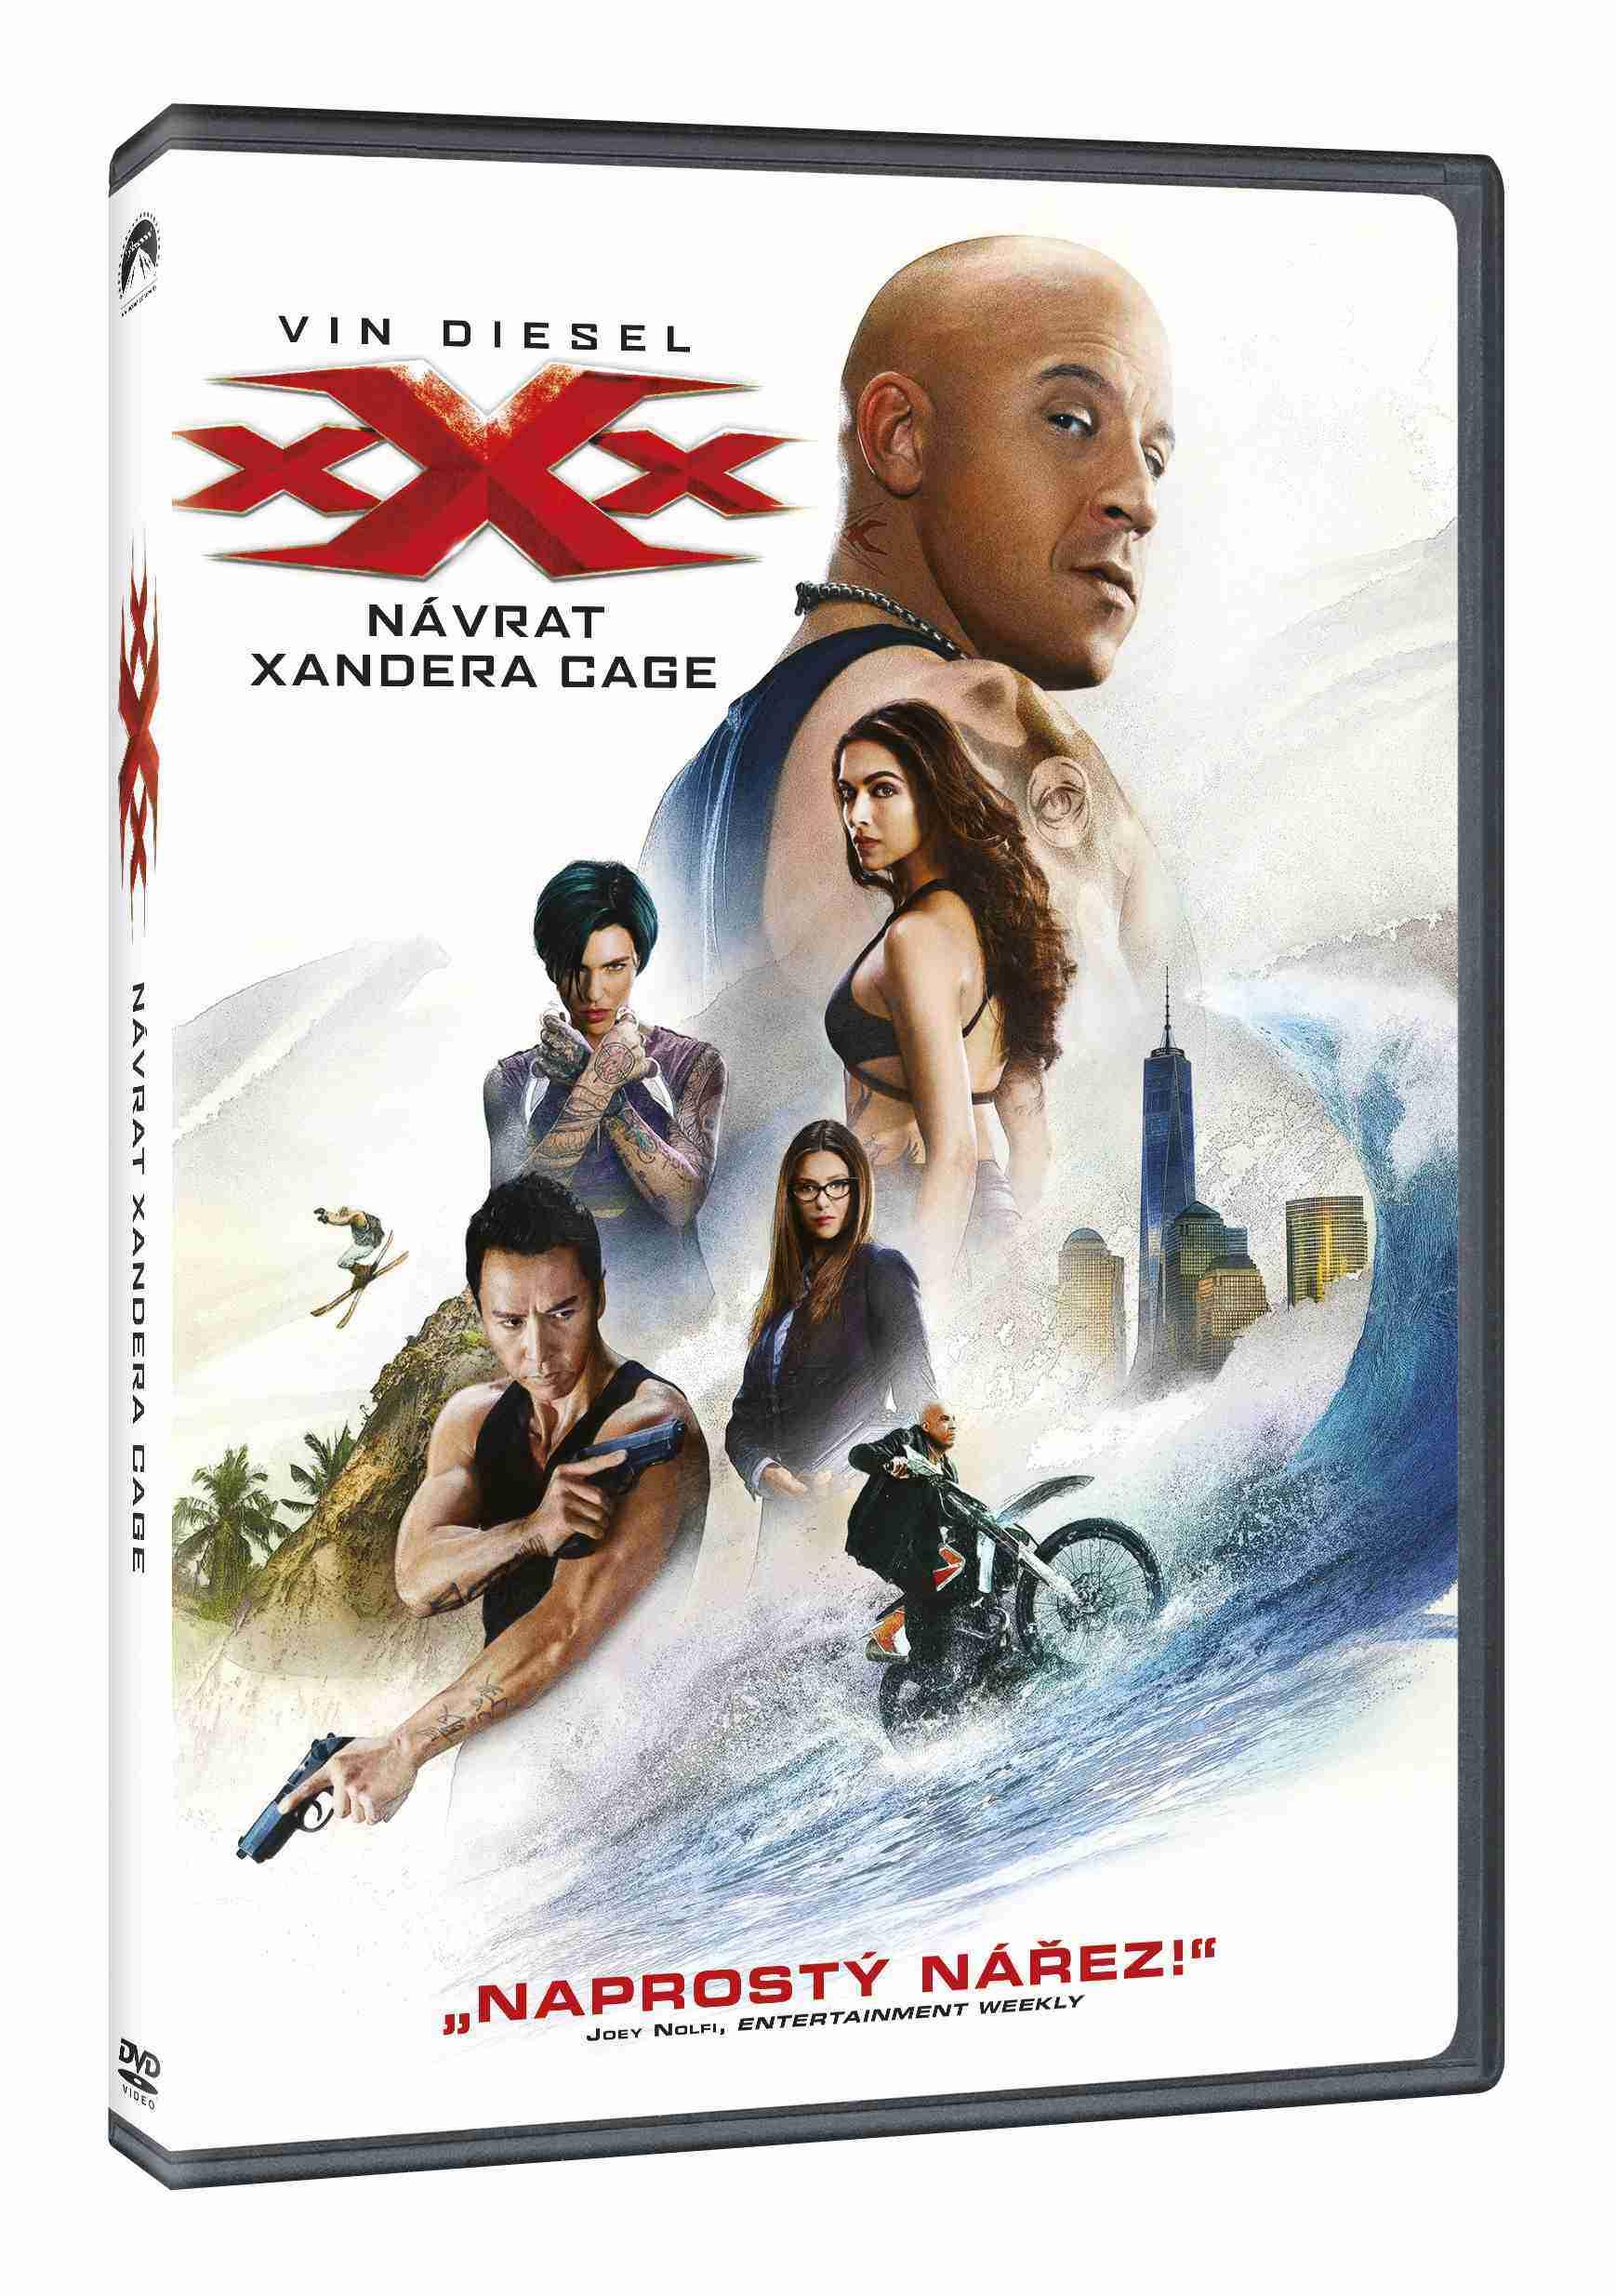 xXx: NÁVRAT XANDERA CAGE - DVD